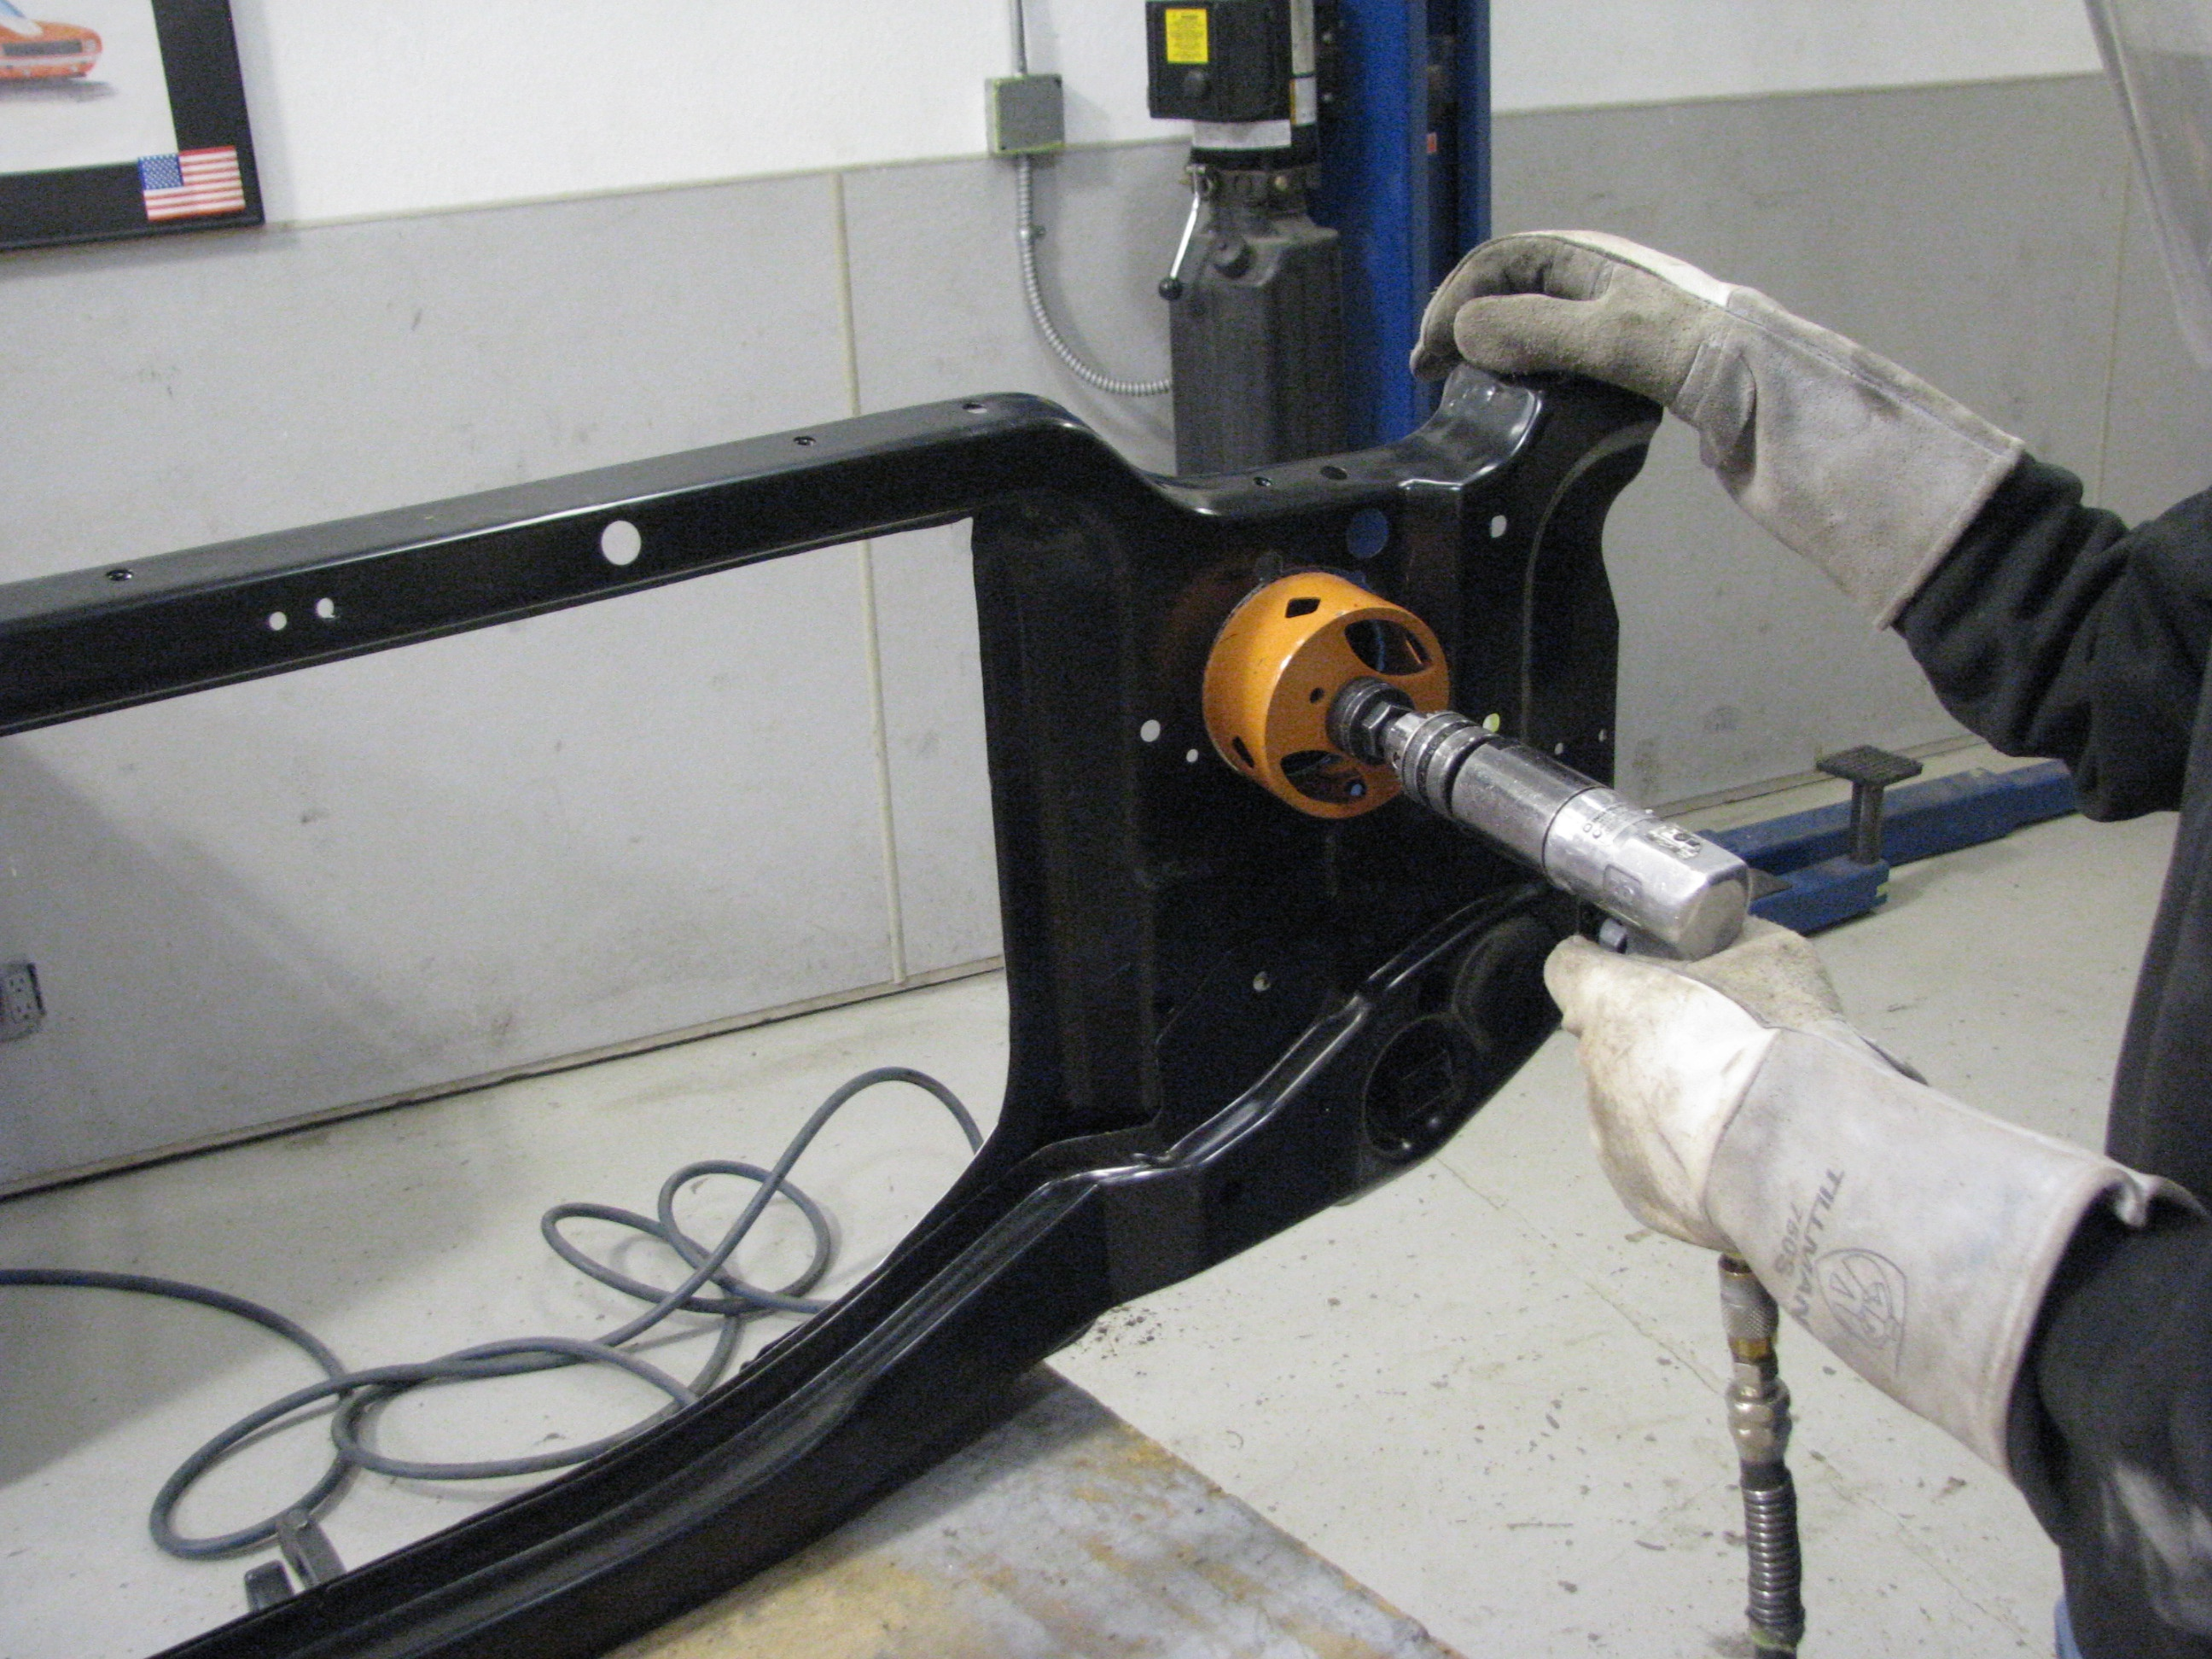 Fixing the Carbon Camaro